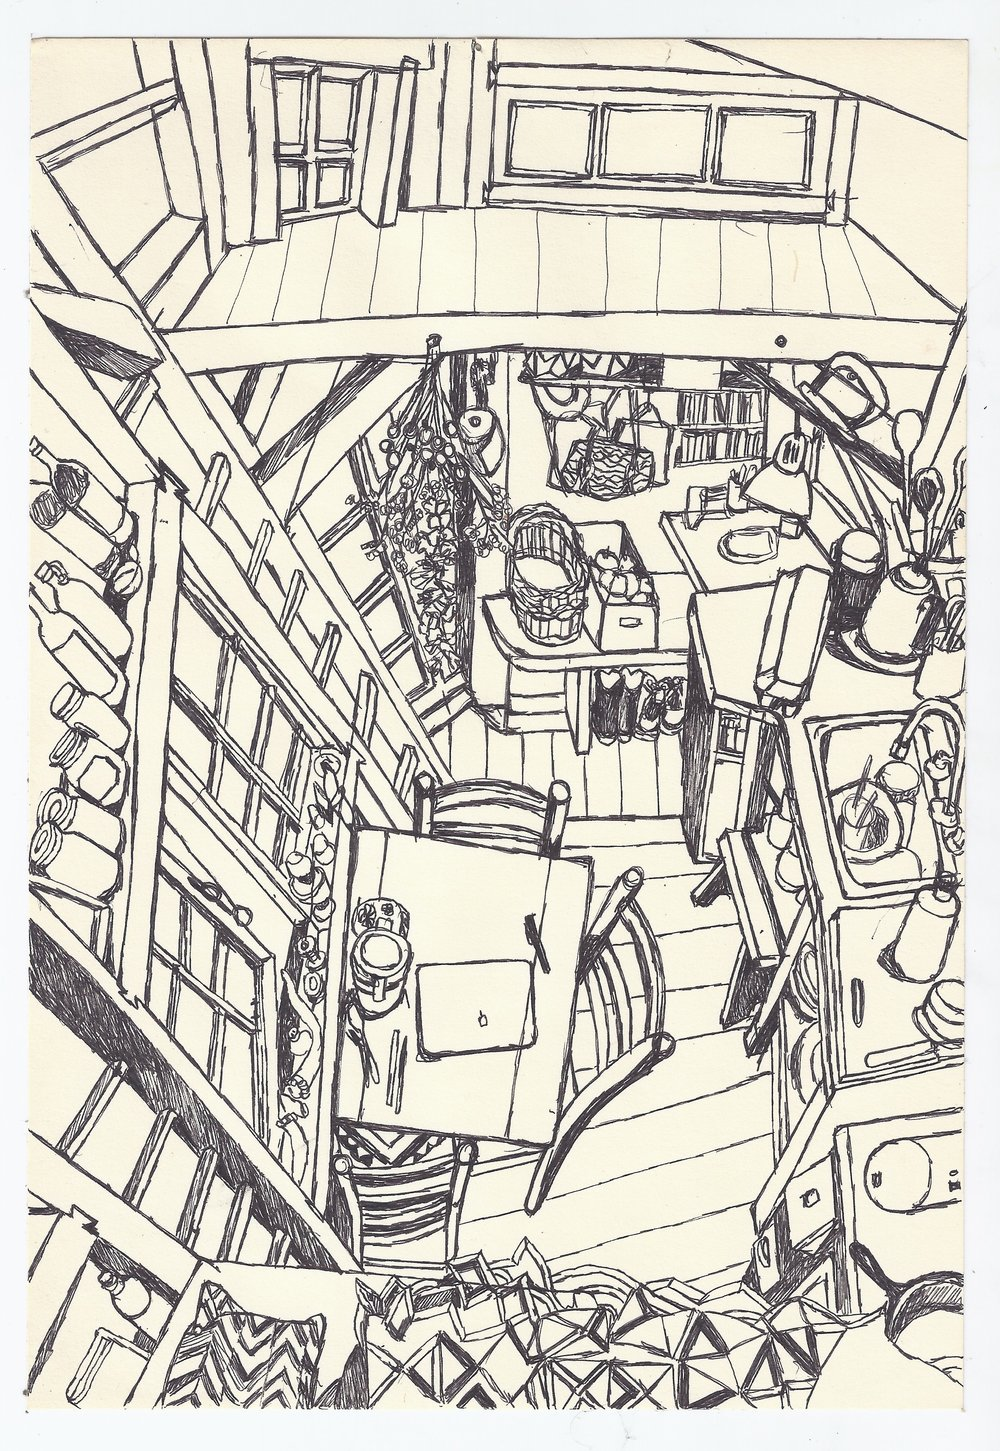 tiny house interior drawing.jpeg